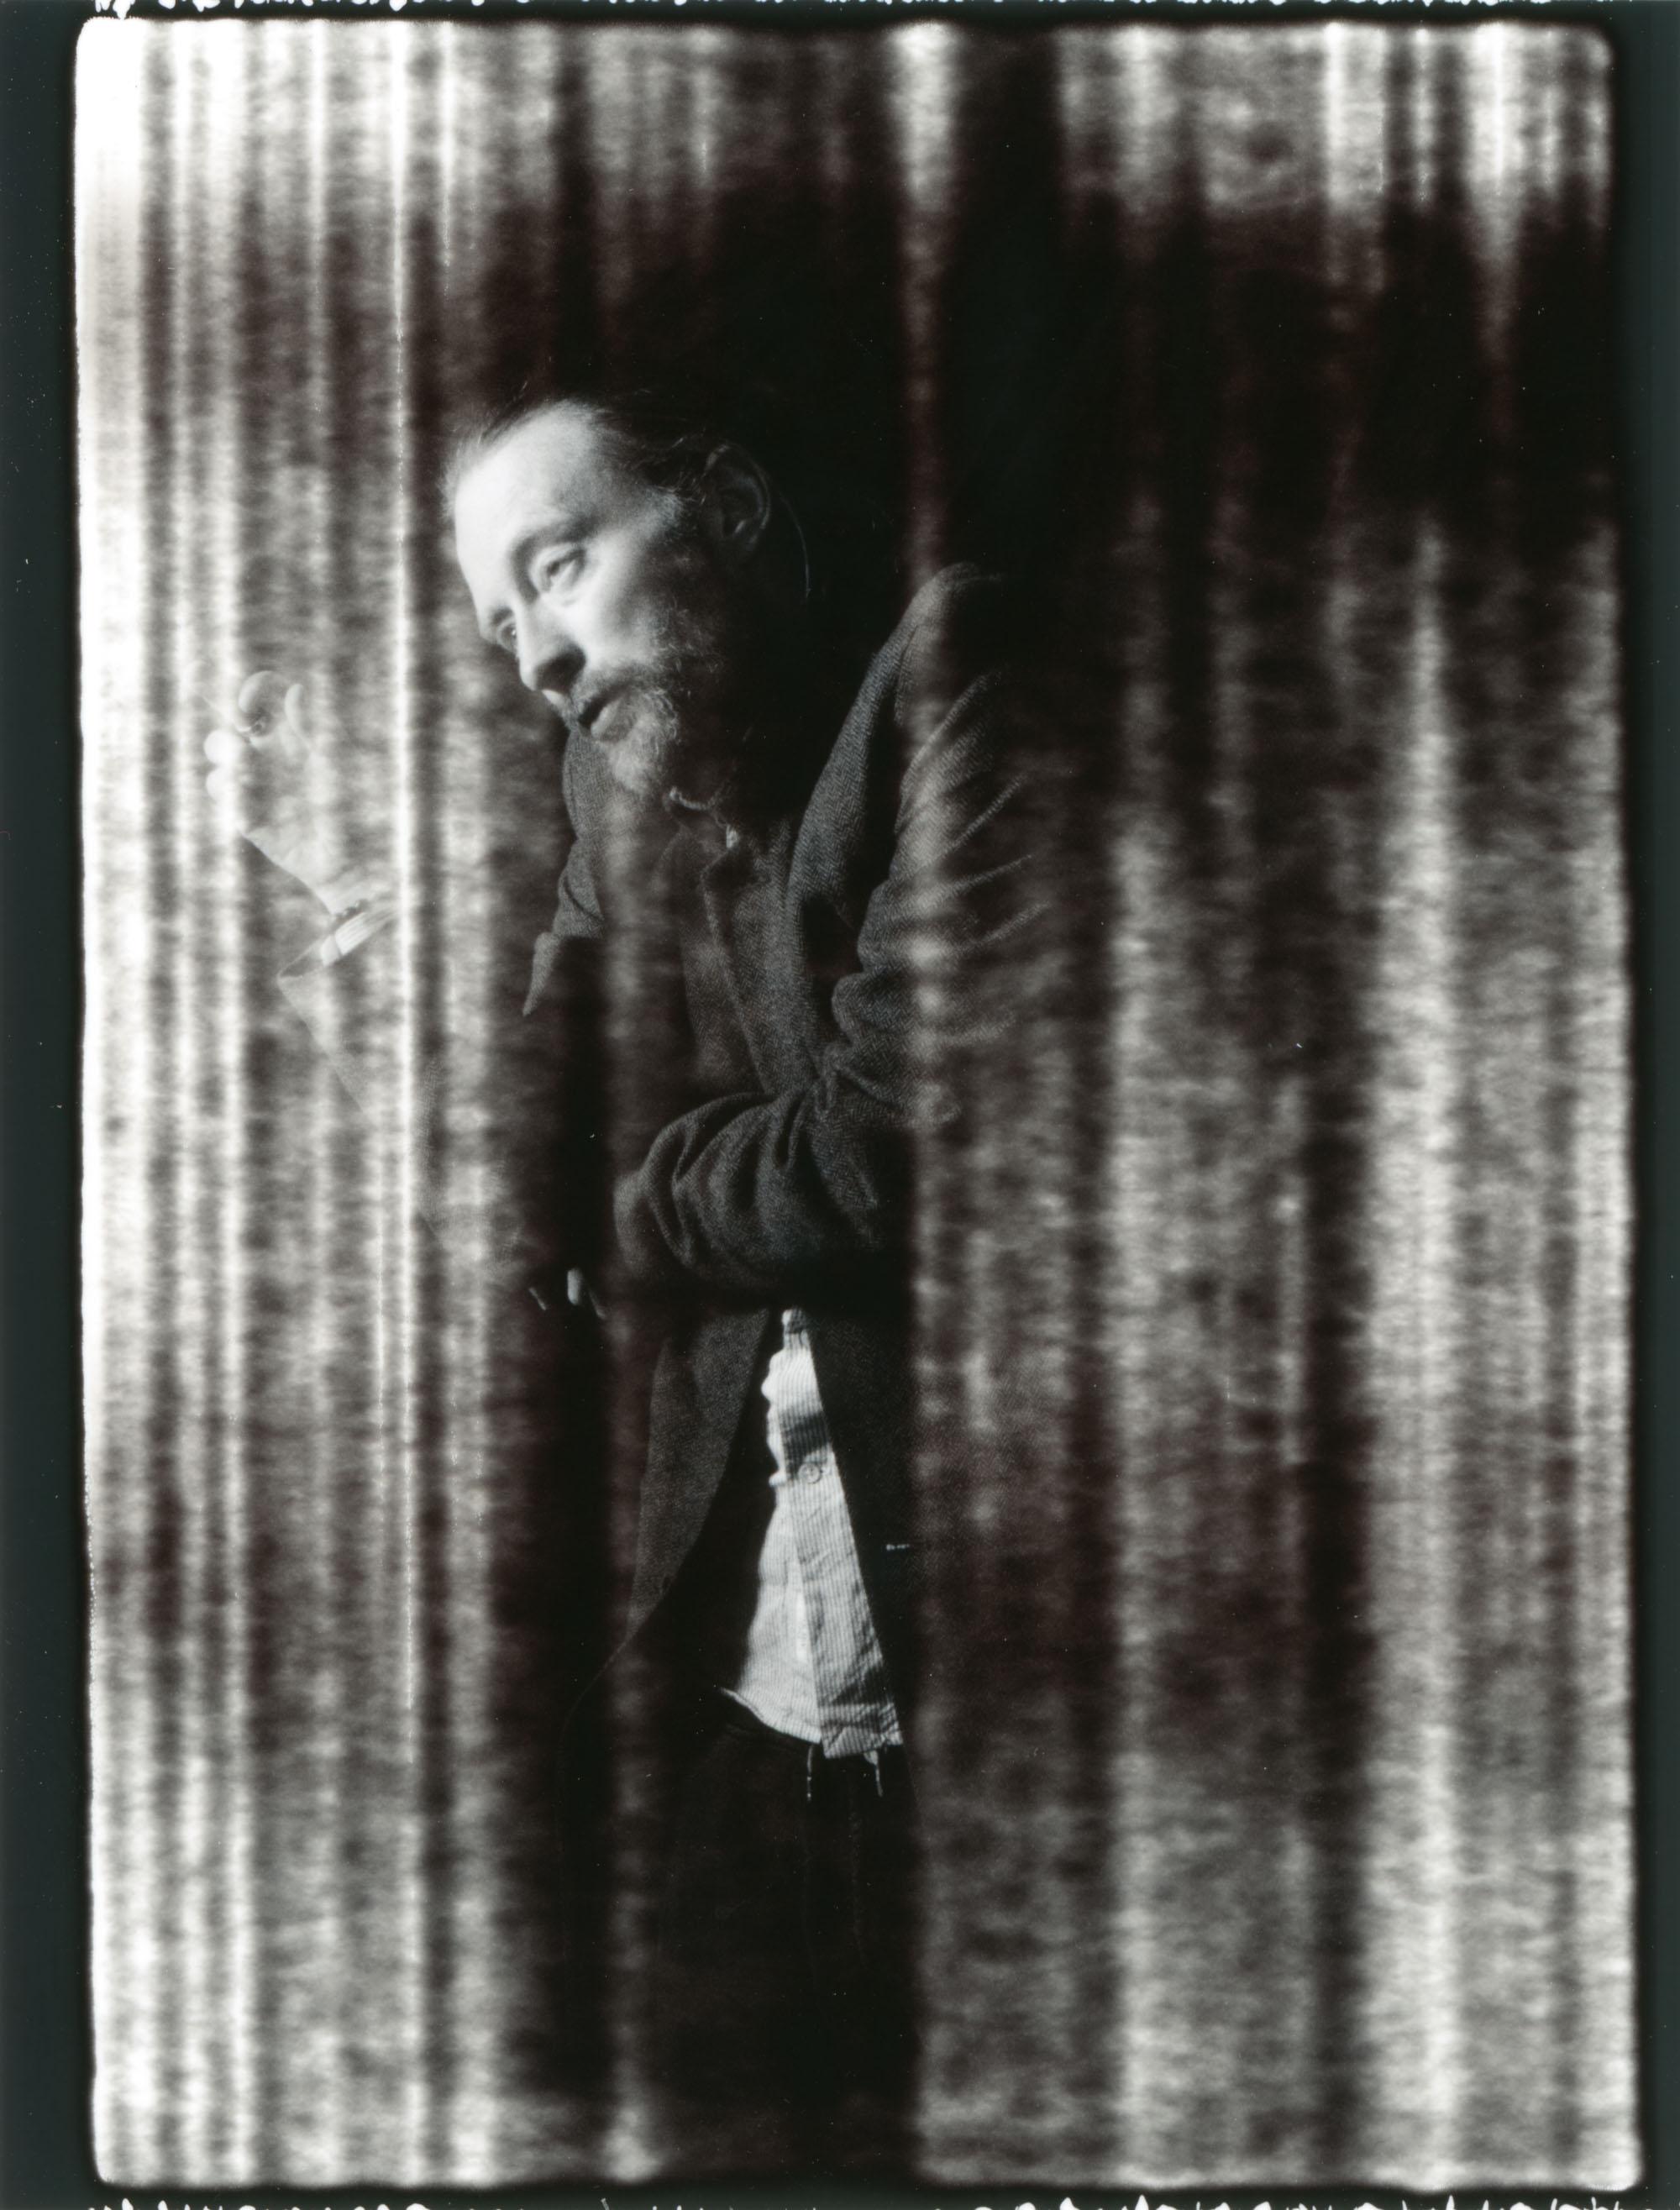 Thom Yorke004_1_cropped.jpg